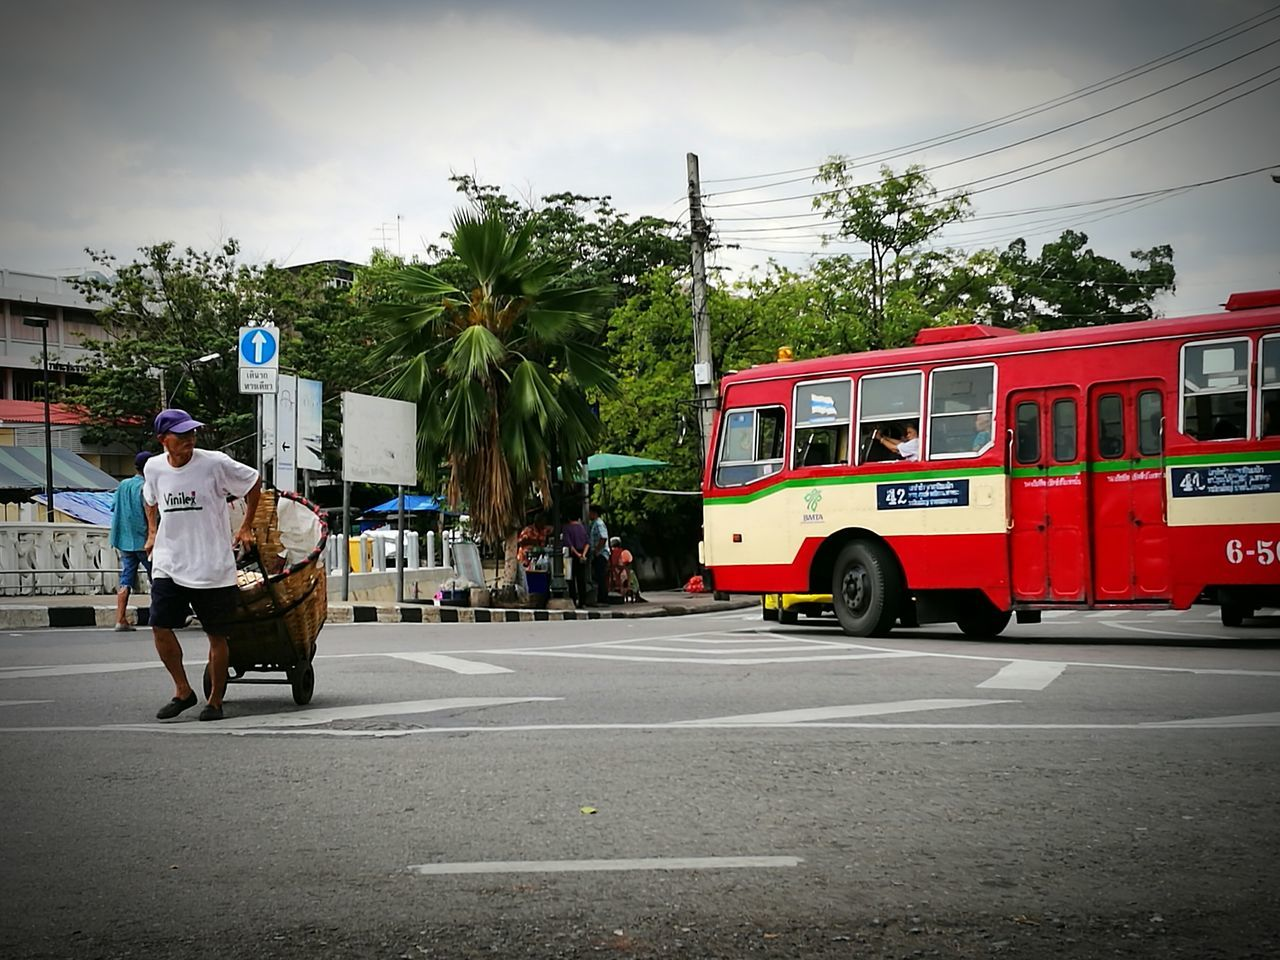 Crossing Mode Of Transport Land Vehicle People Bangkok Thailand Bangkok Streetphotography Streetphotography Street Streetphotographer Street Photography EyeEm Best Shots - The Streets EyeEm Best Shots EyeEmBestPics Eyeemphotography EyeEm Gallery EyeEm Color Photography Colour Photography